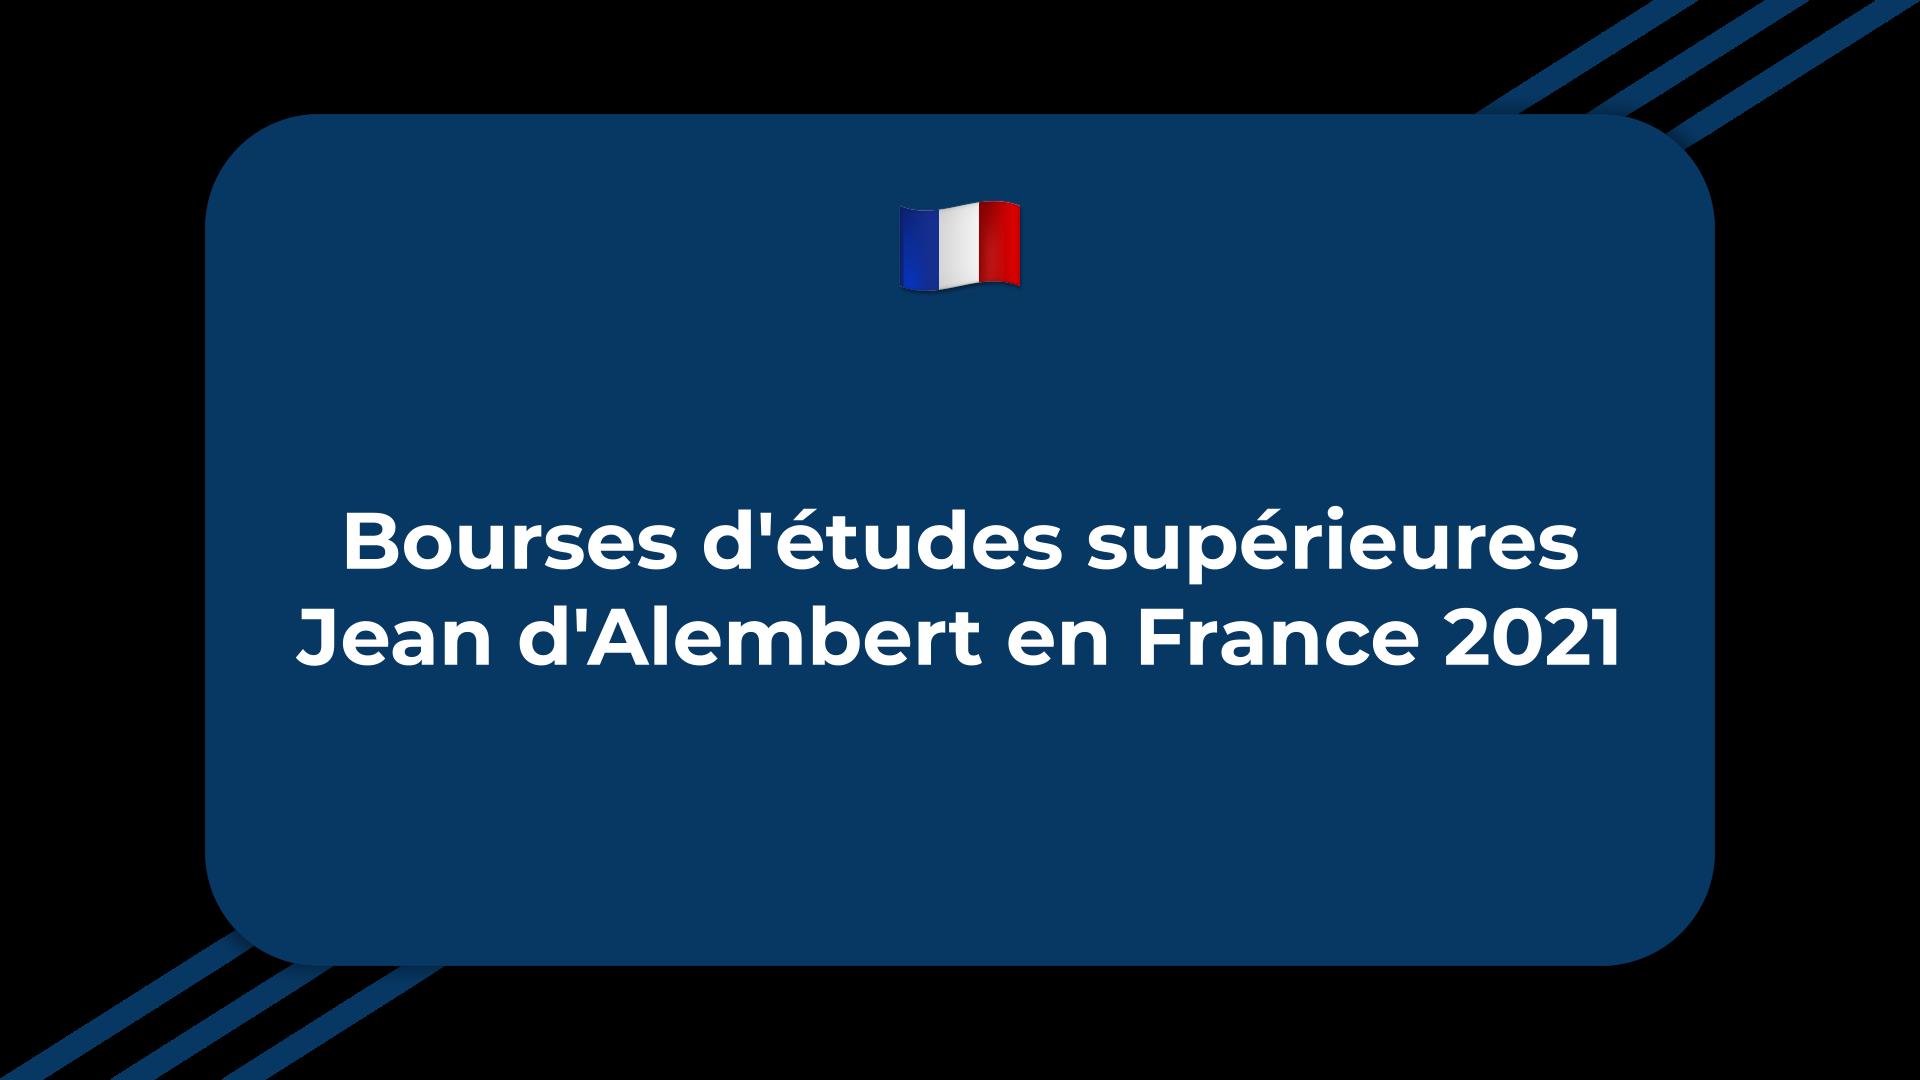 Bourses d'études supérieures Jean d'Alembert